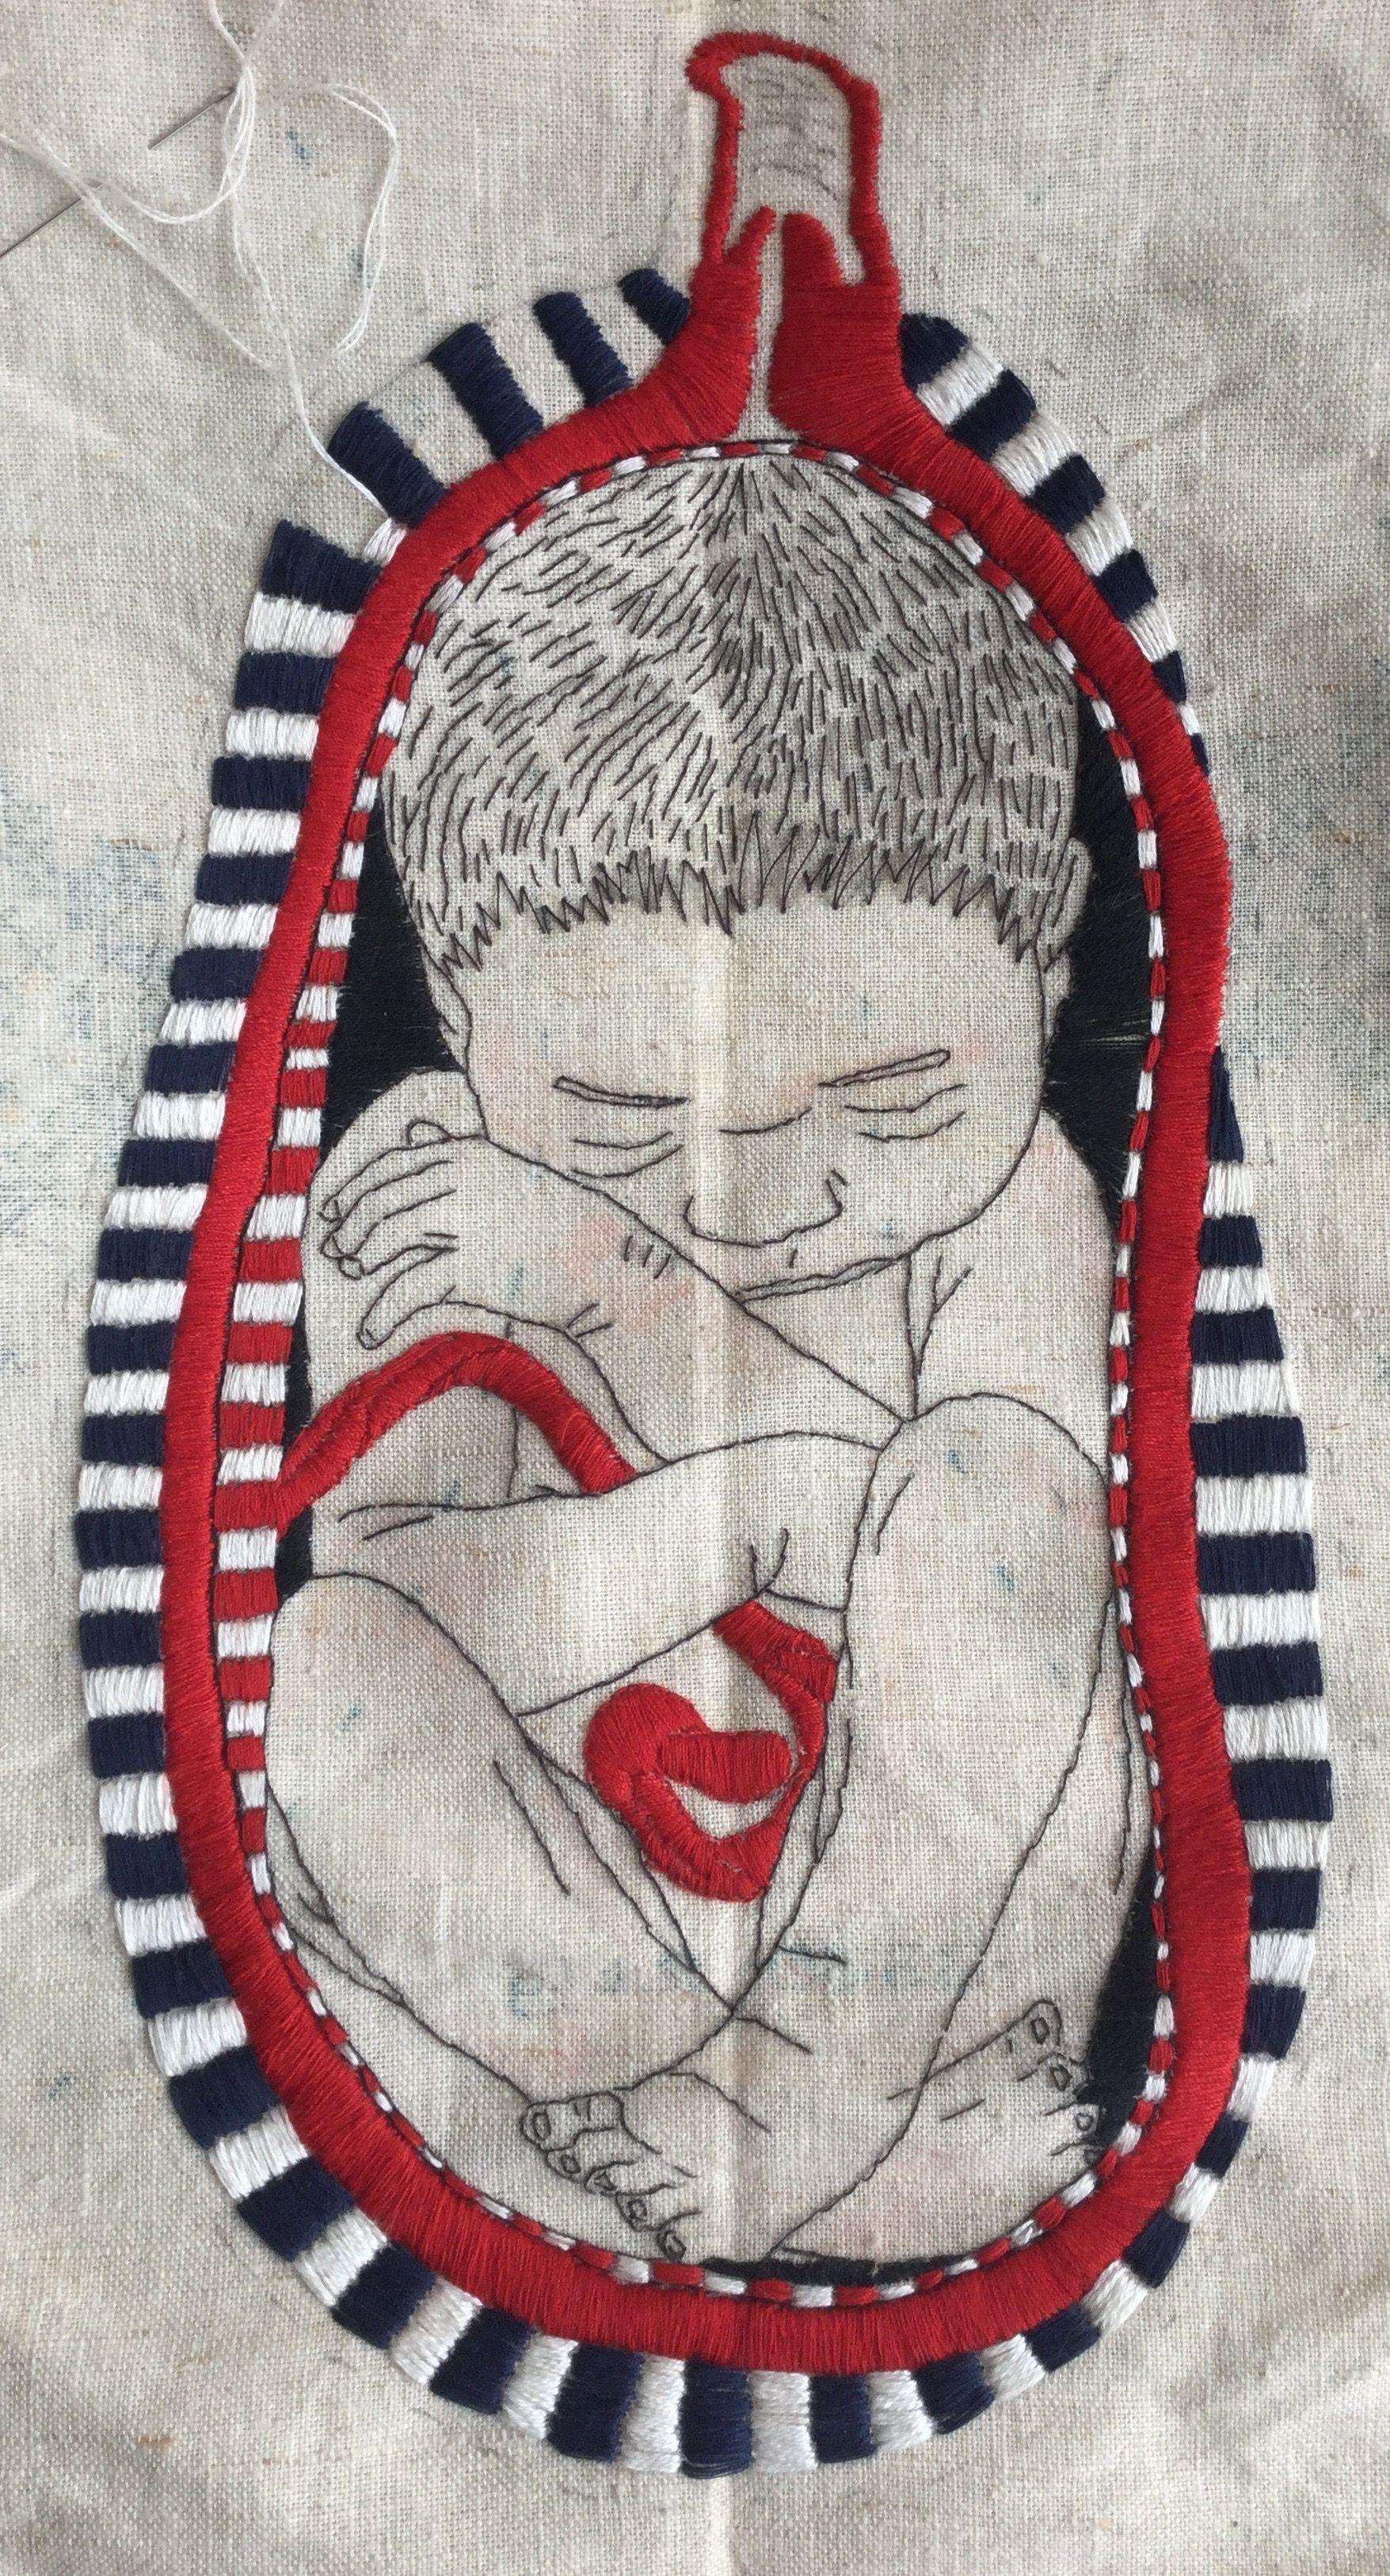 Work in progress karin van der linden medical art pinterest